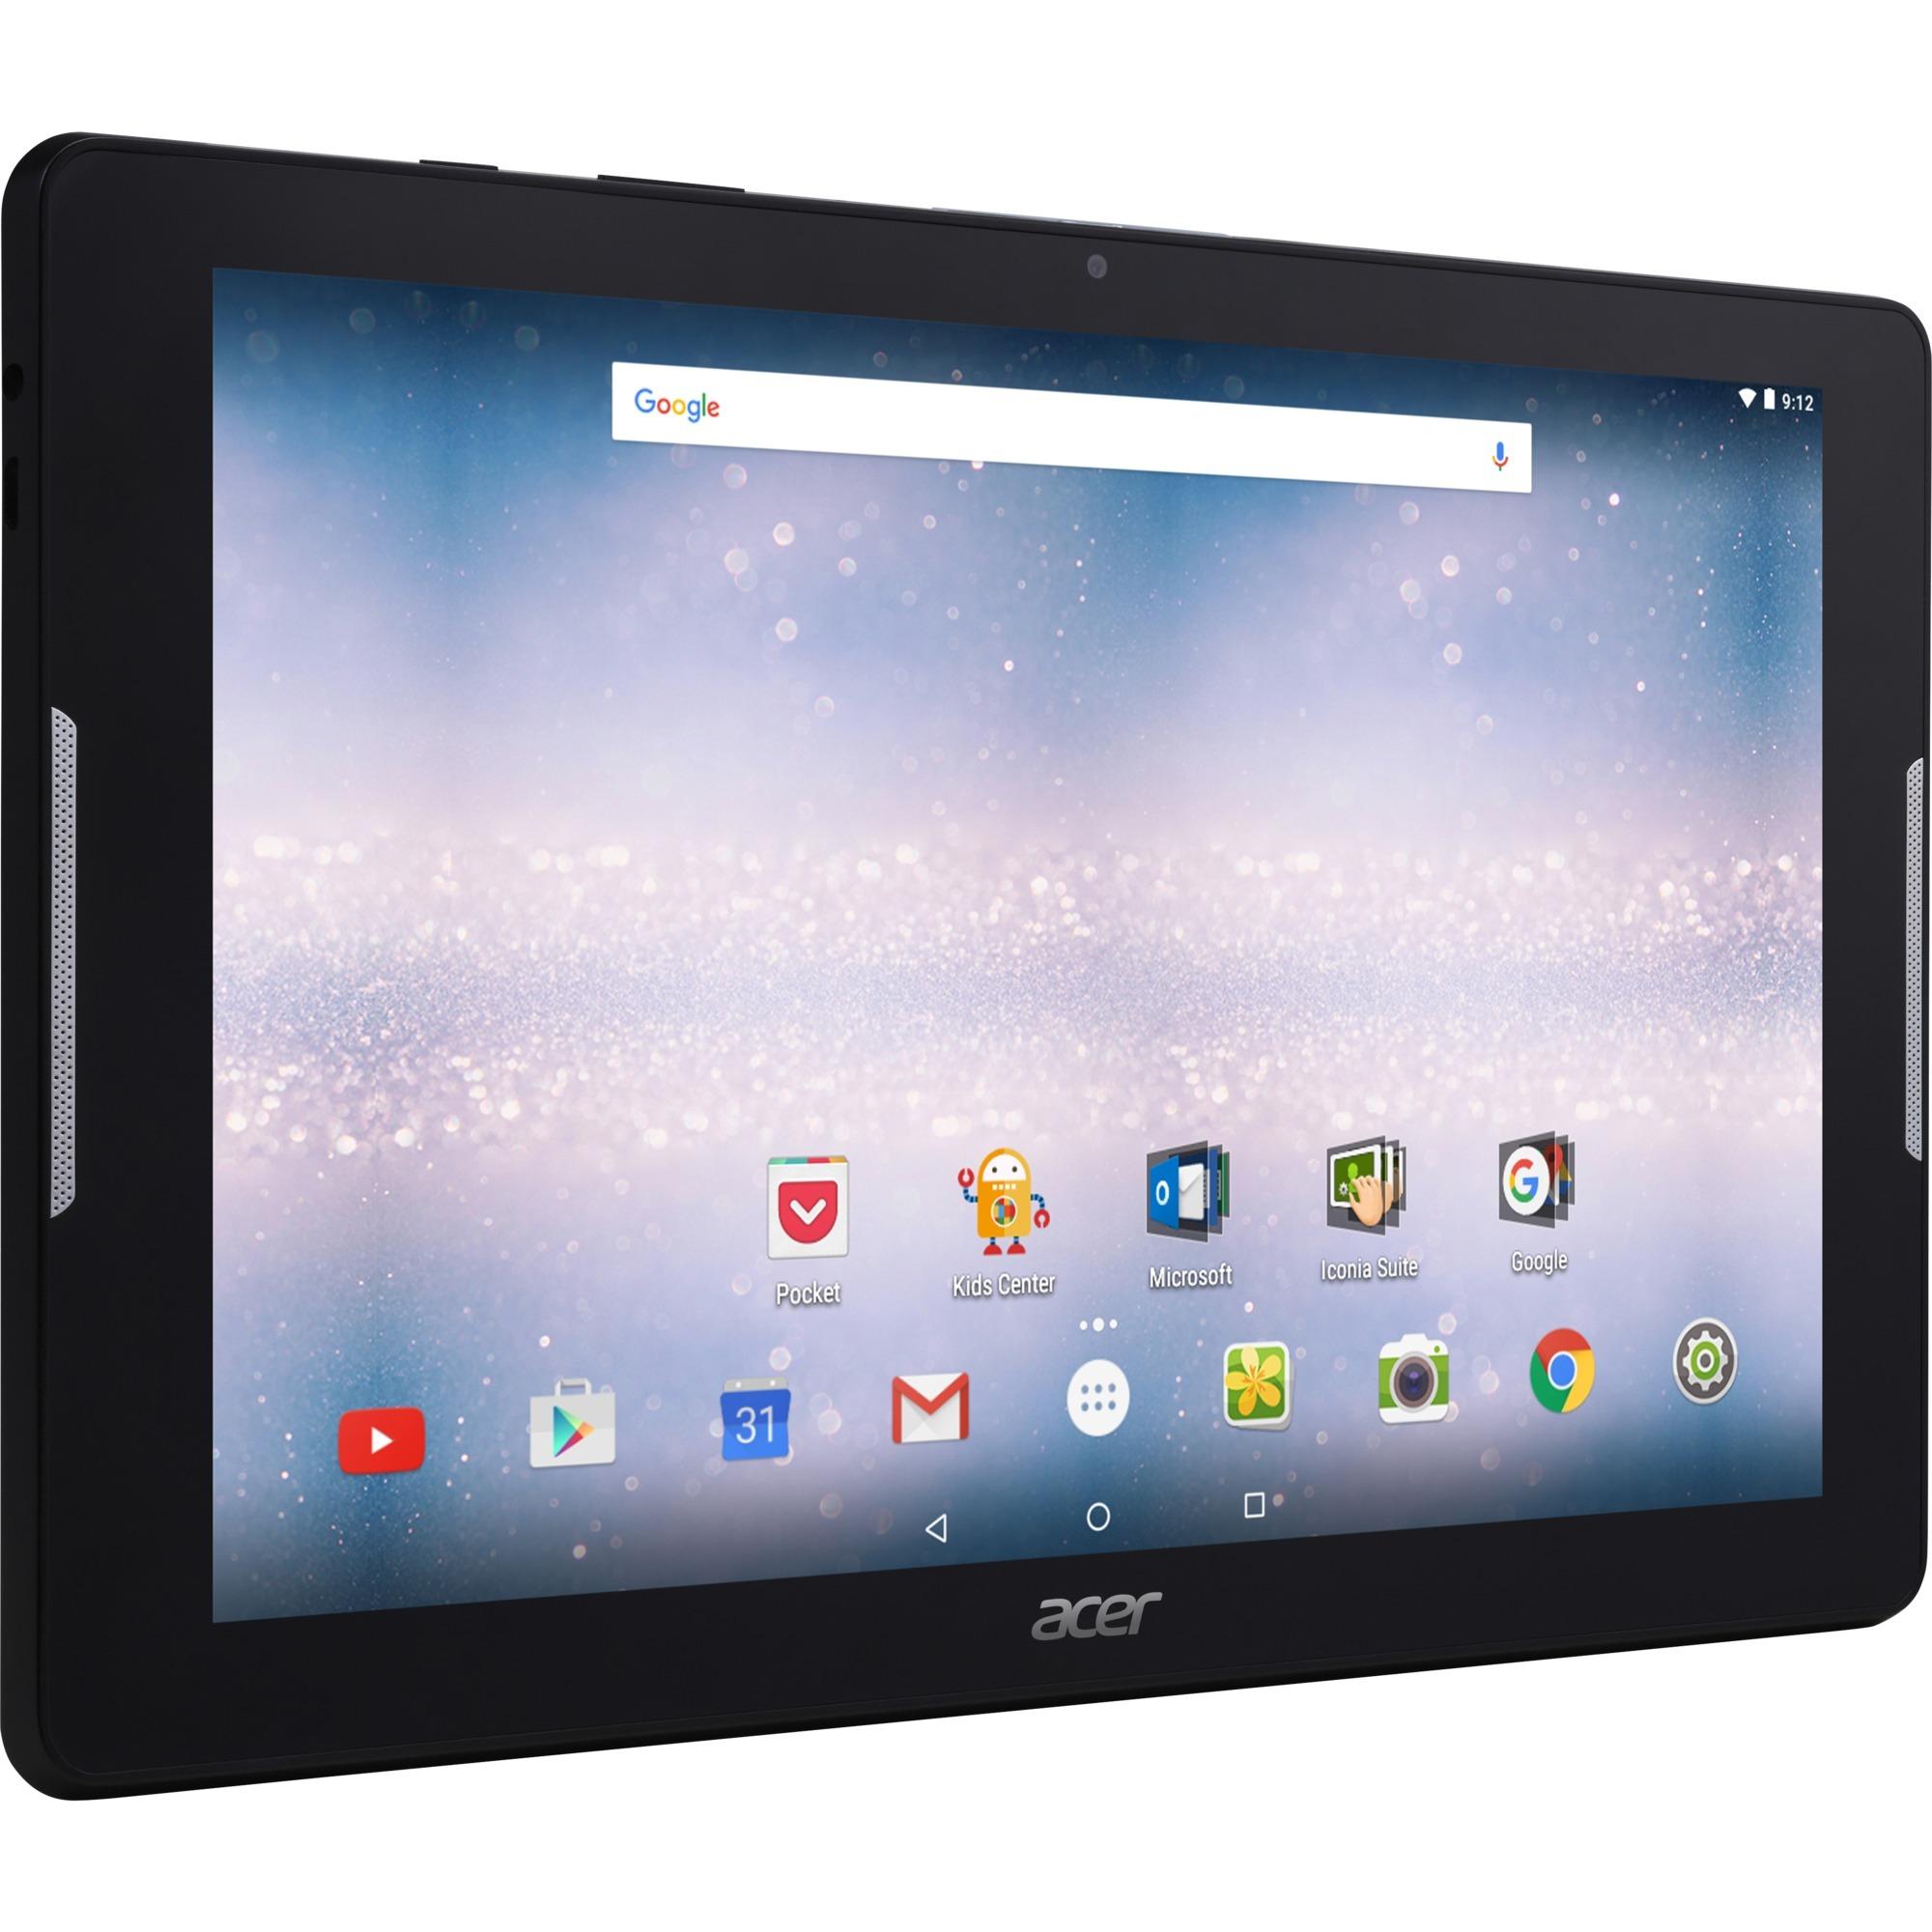 Prezzi Notebook Tablet Acer Aspire Prezzi E Negozi